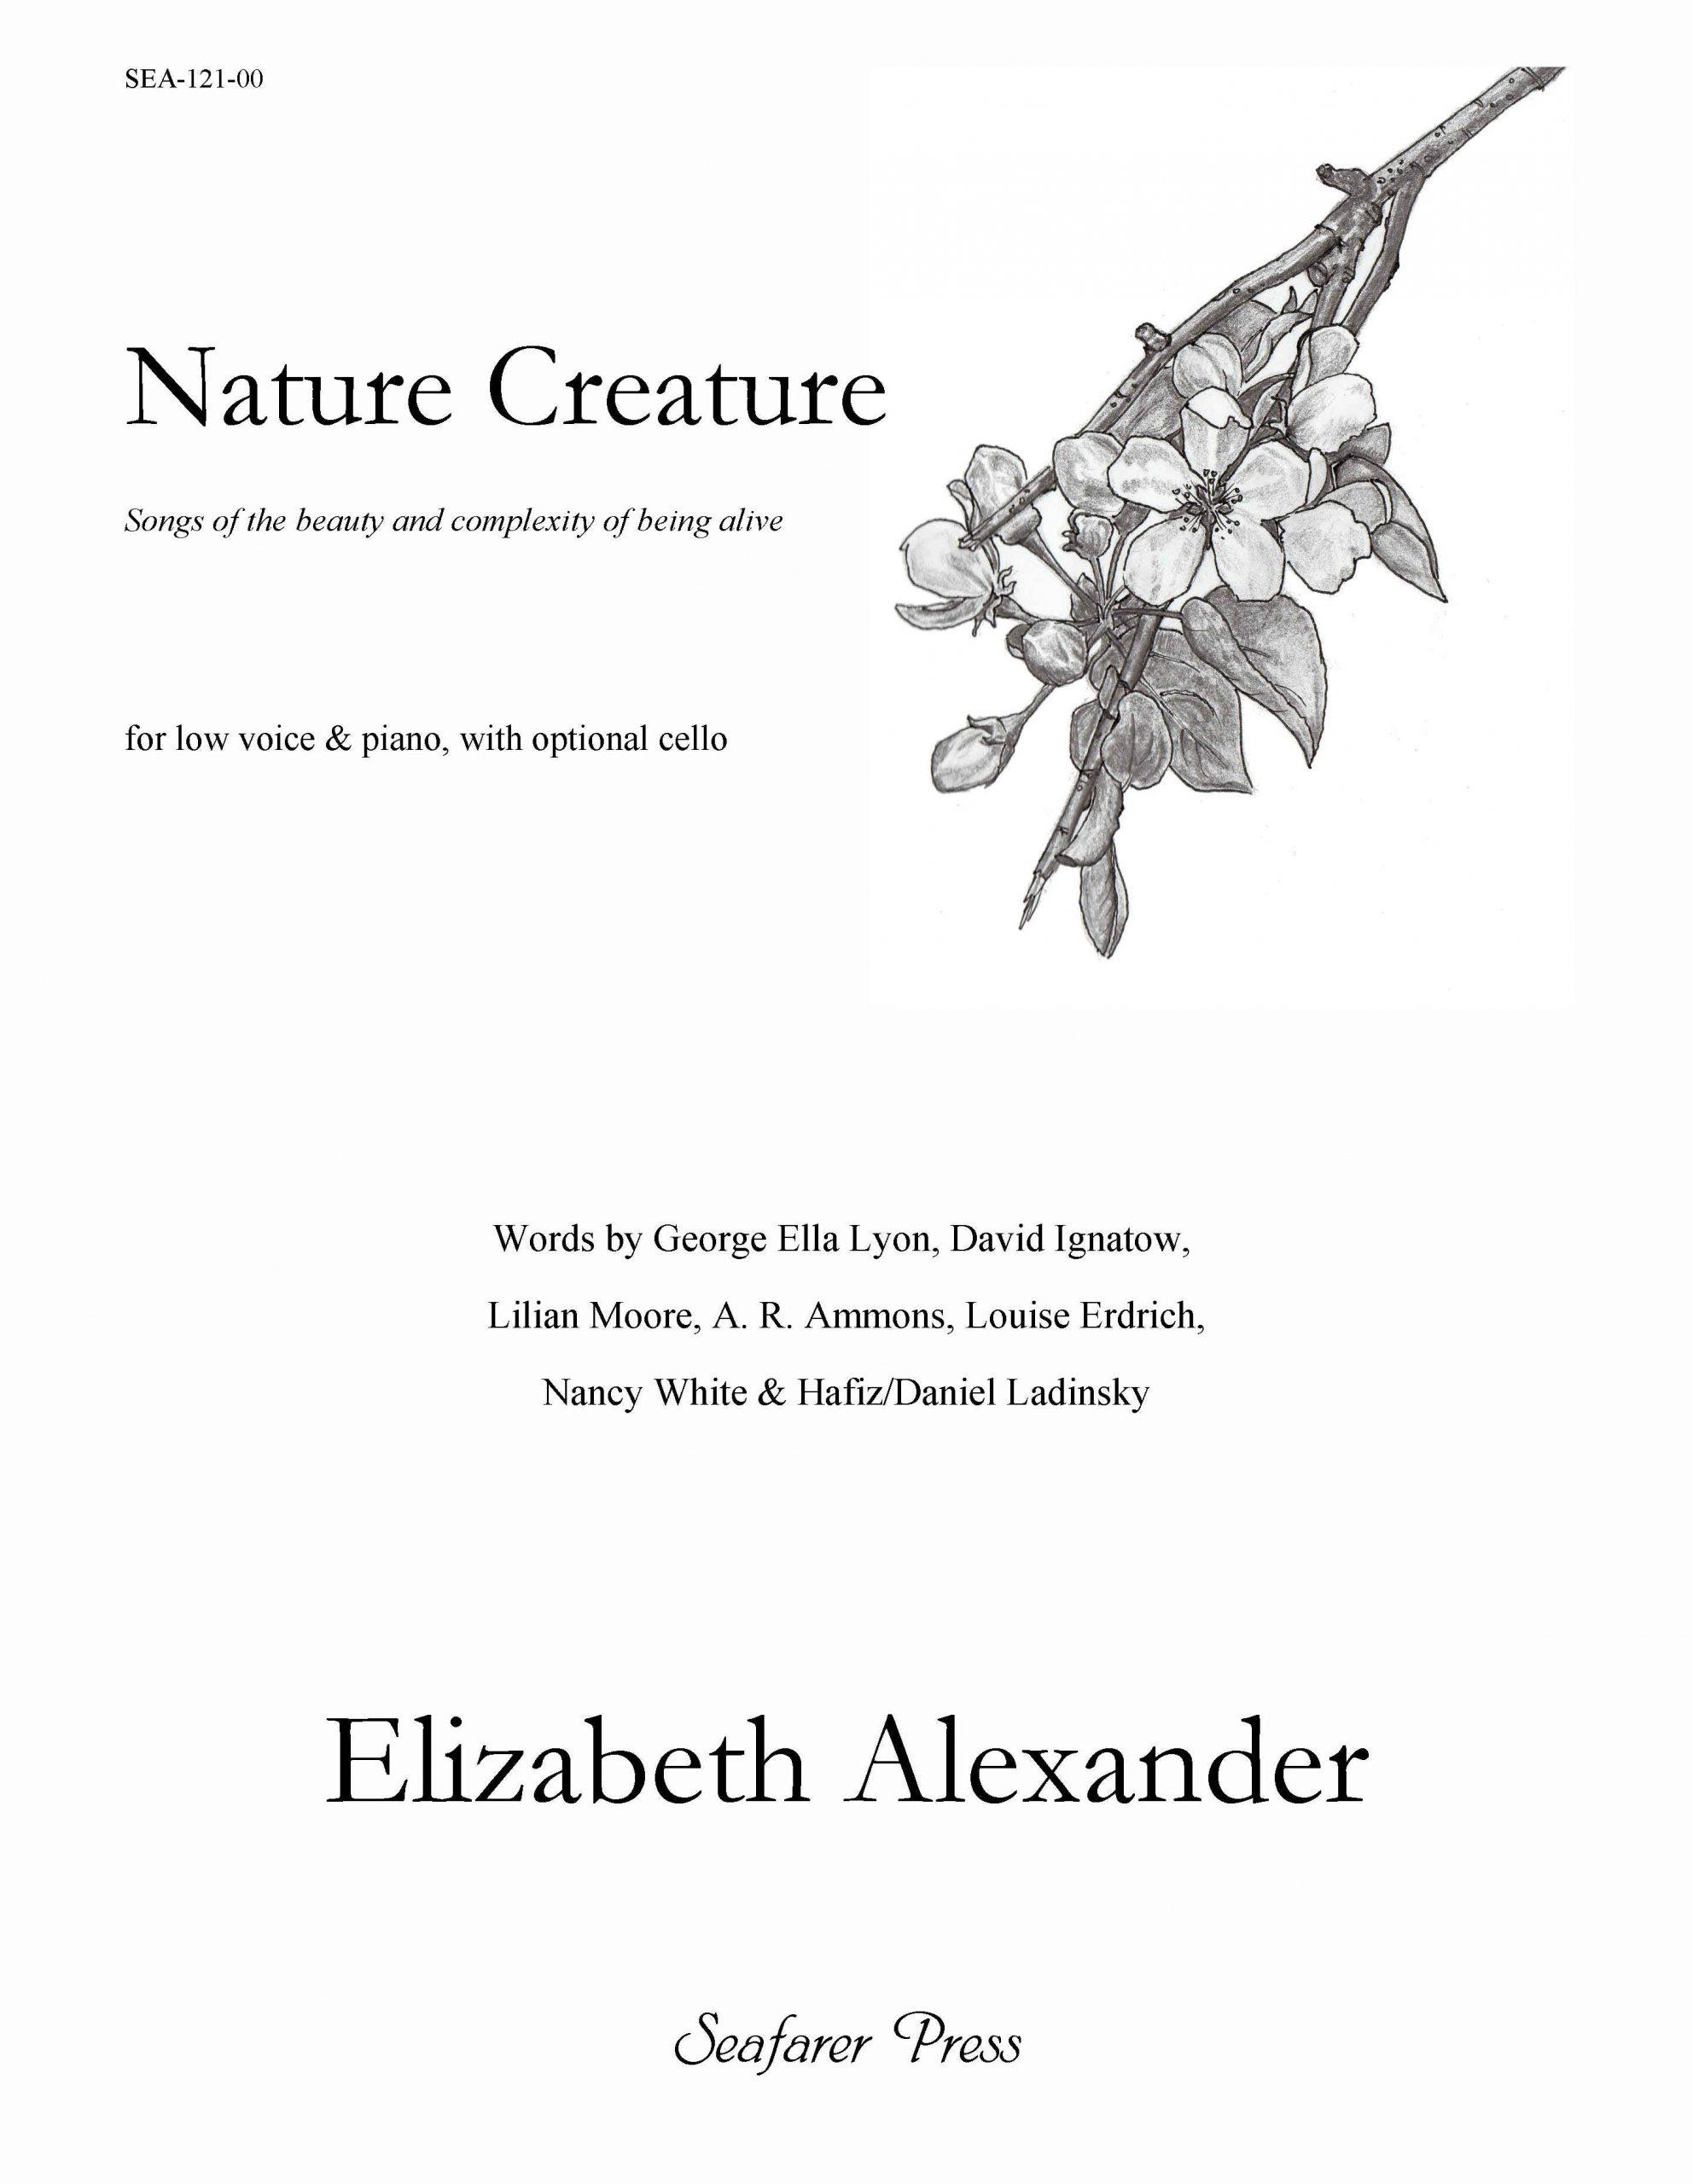 SEA-121-00 - Nature Creature